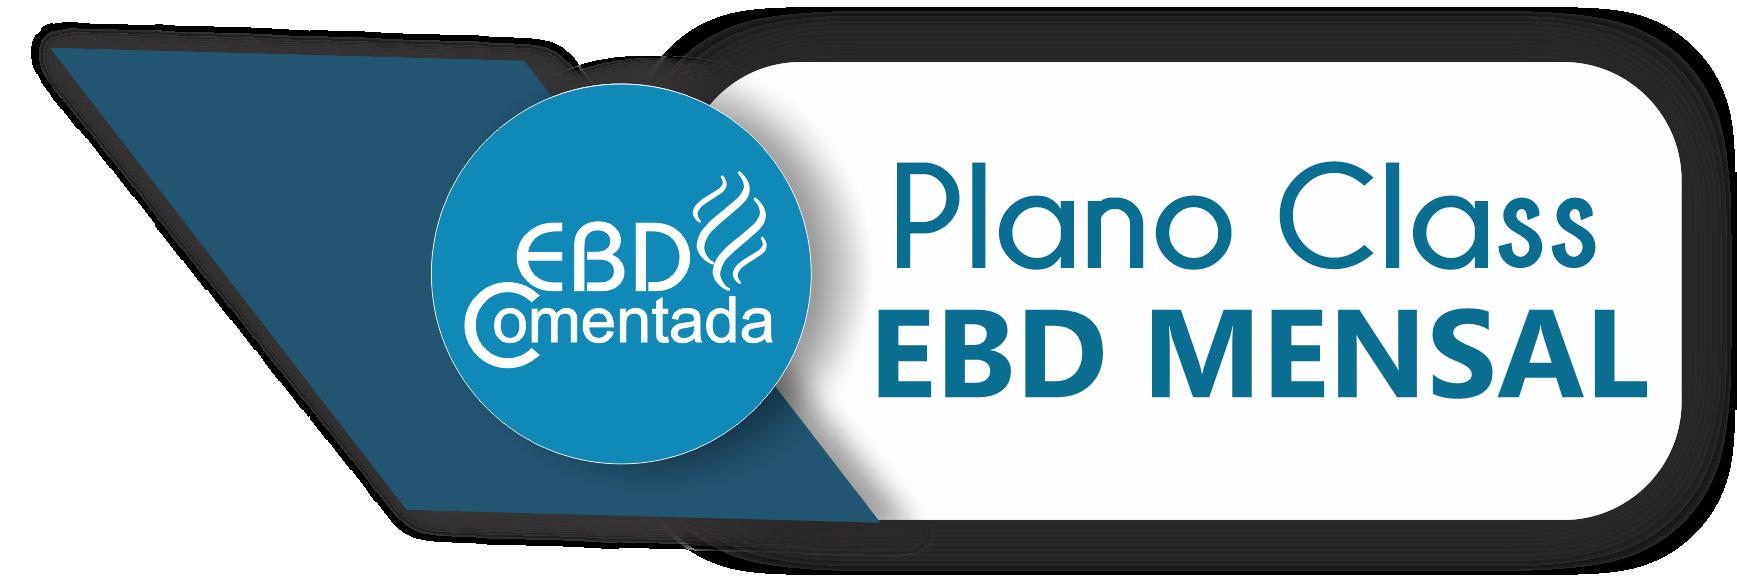 Plano Class EBD Mensal1